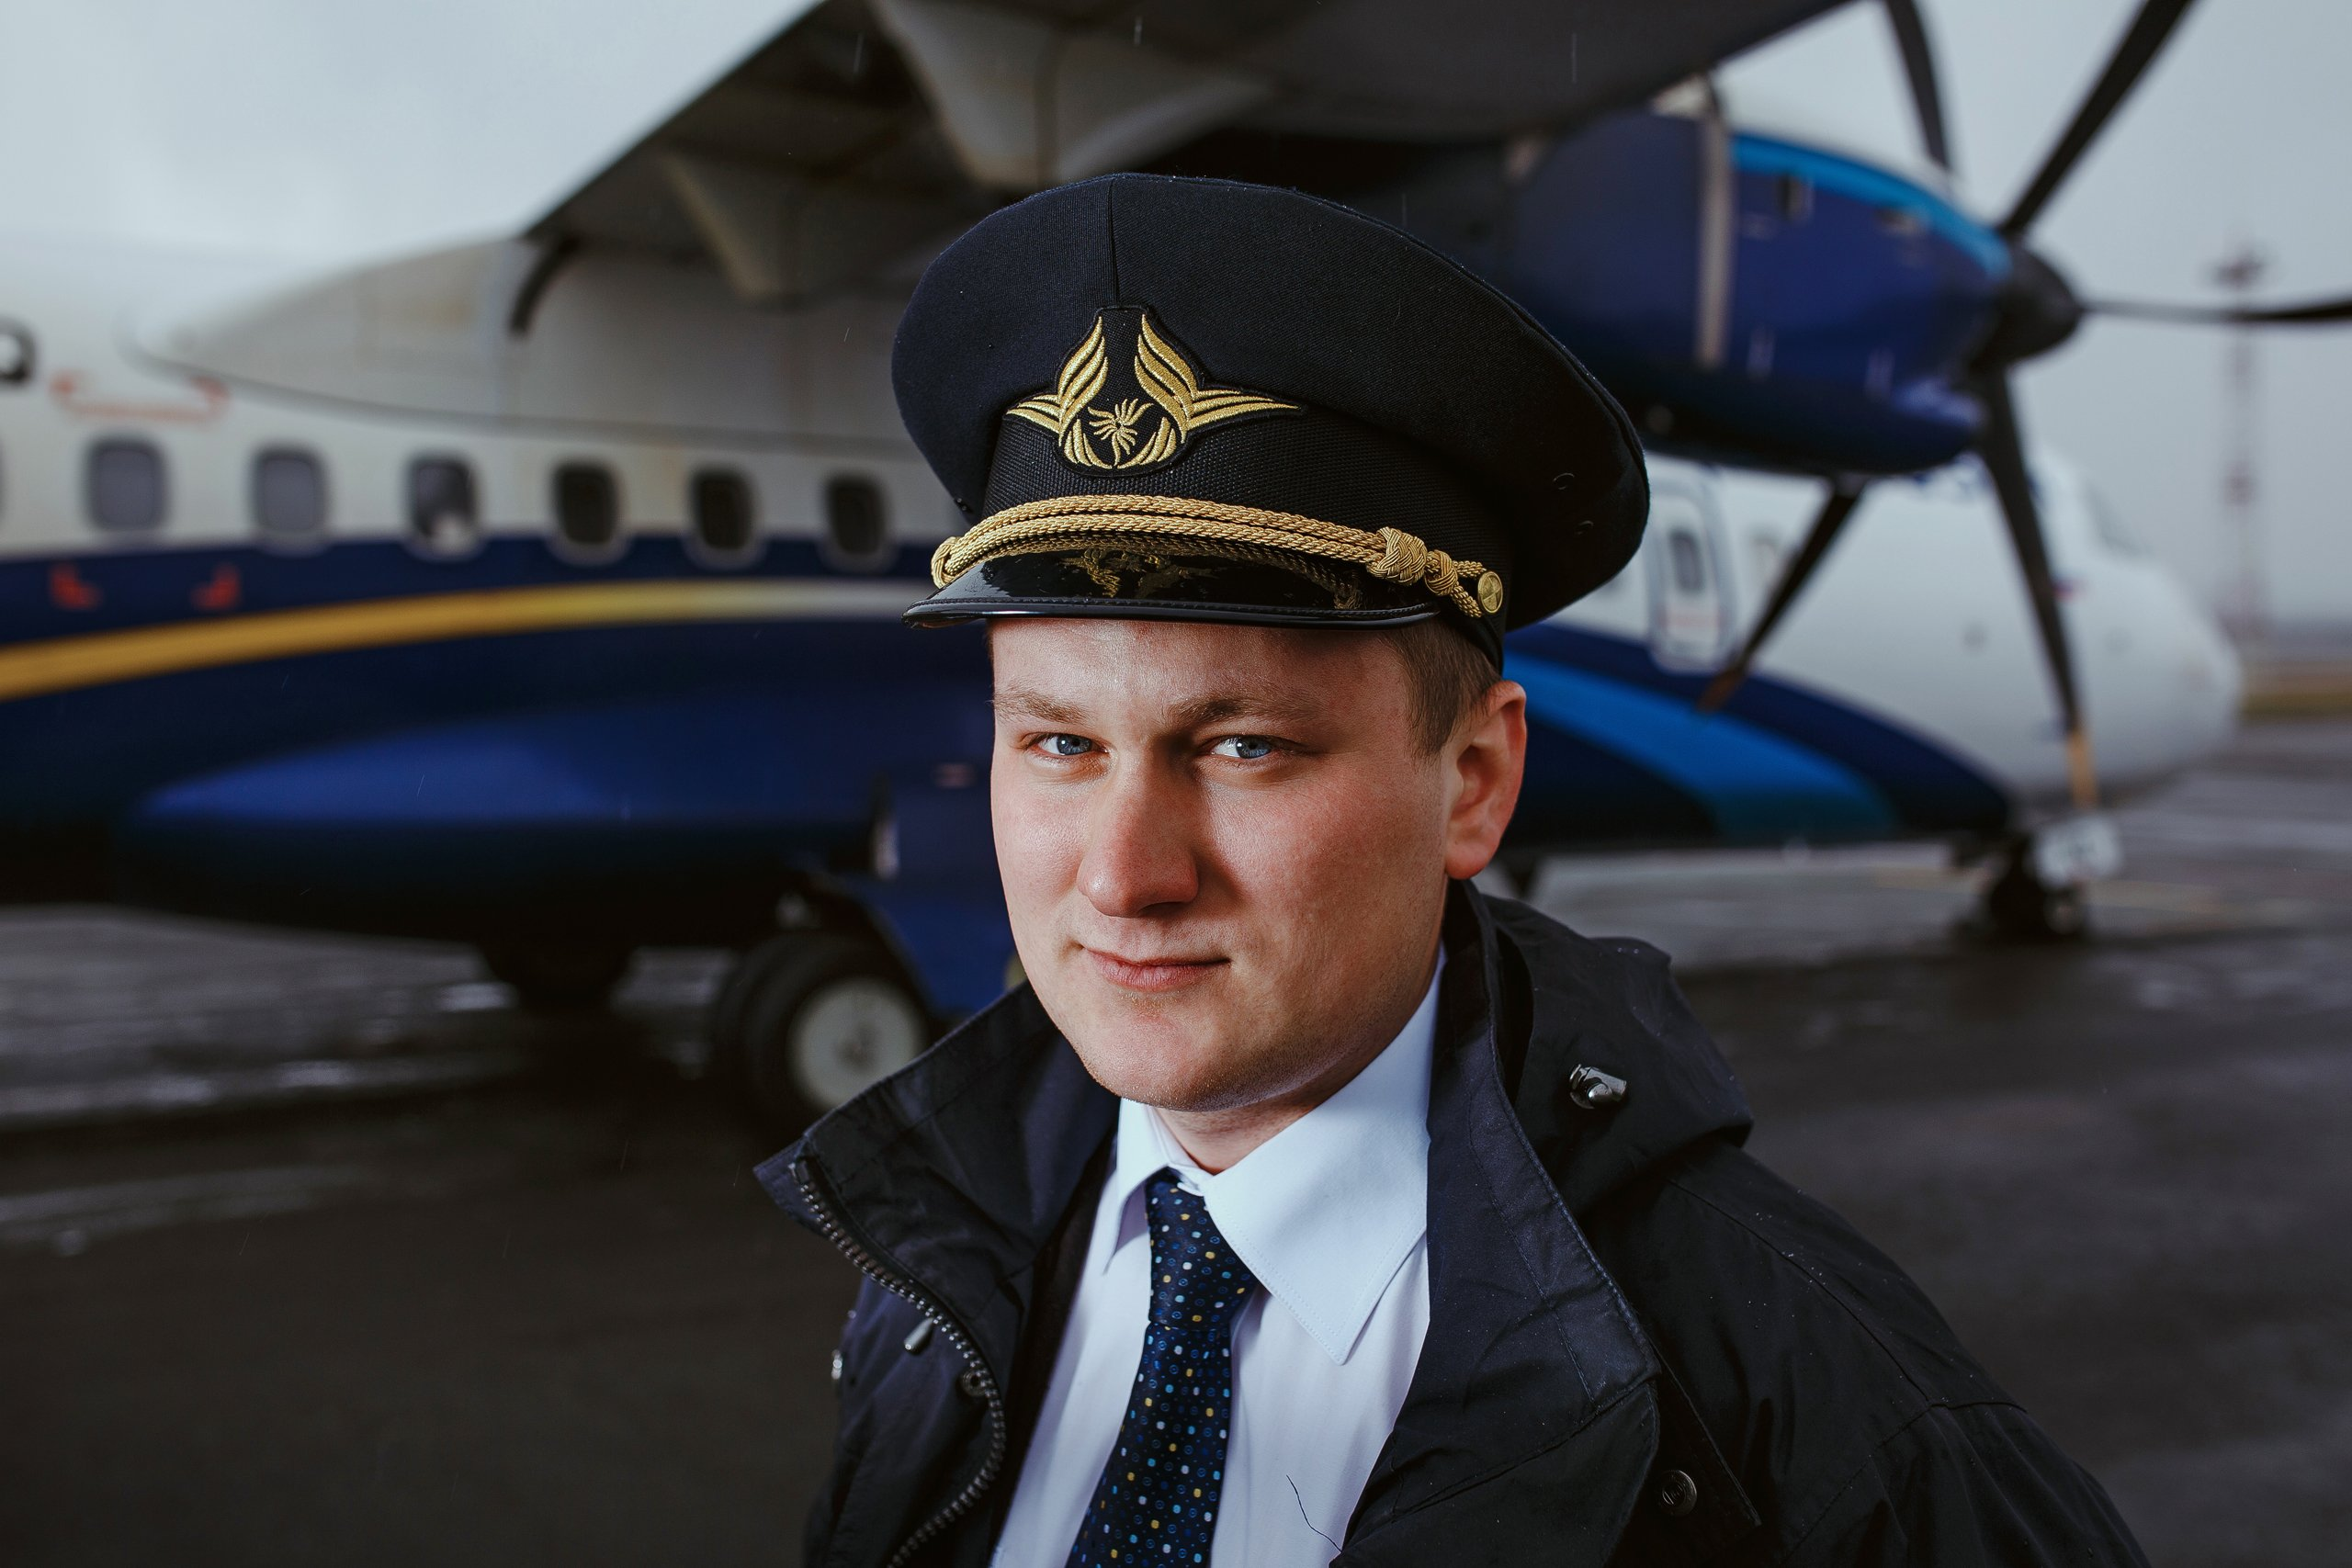 air, avia, aviator, nerozya, pilot, portrait, sky, авиа, авиация, аэро, летчик, небо, нерозя, пилот, портрет, самолет, Aleksandr Nerozya